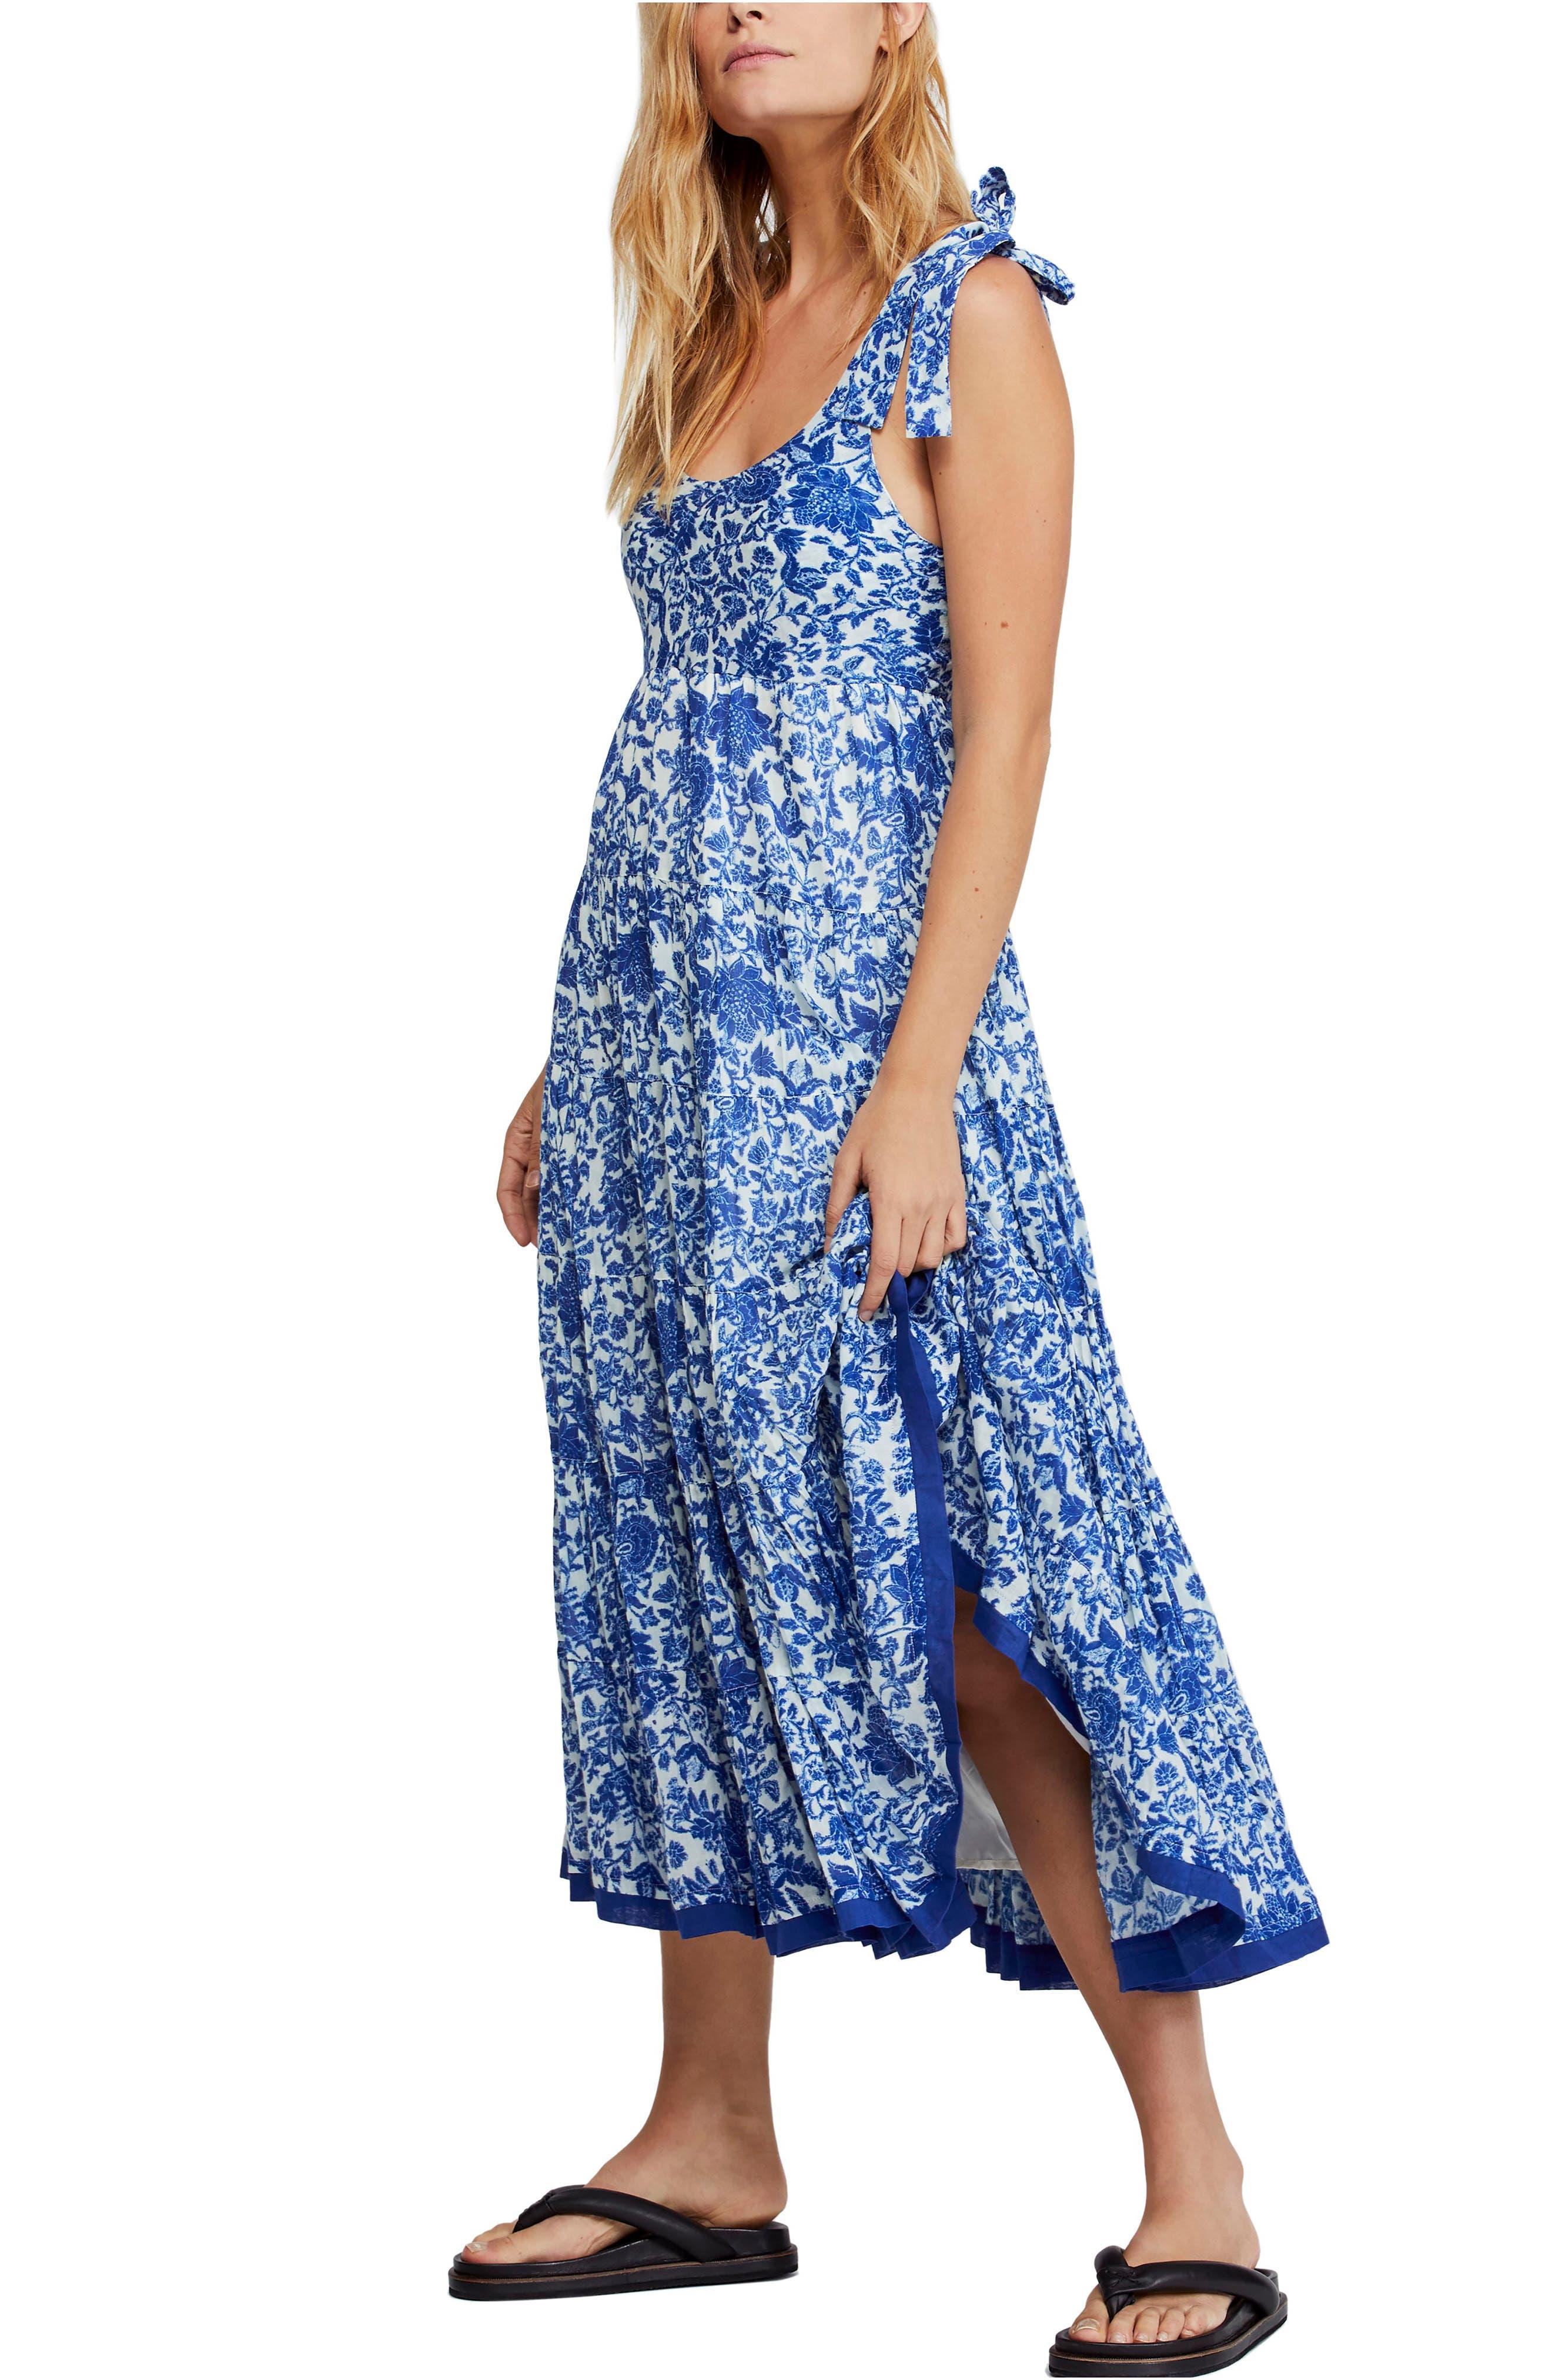 Free People Kikas Print Dress, Blue